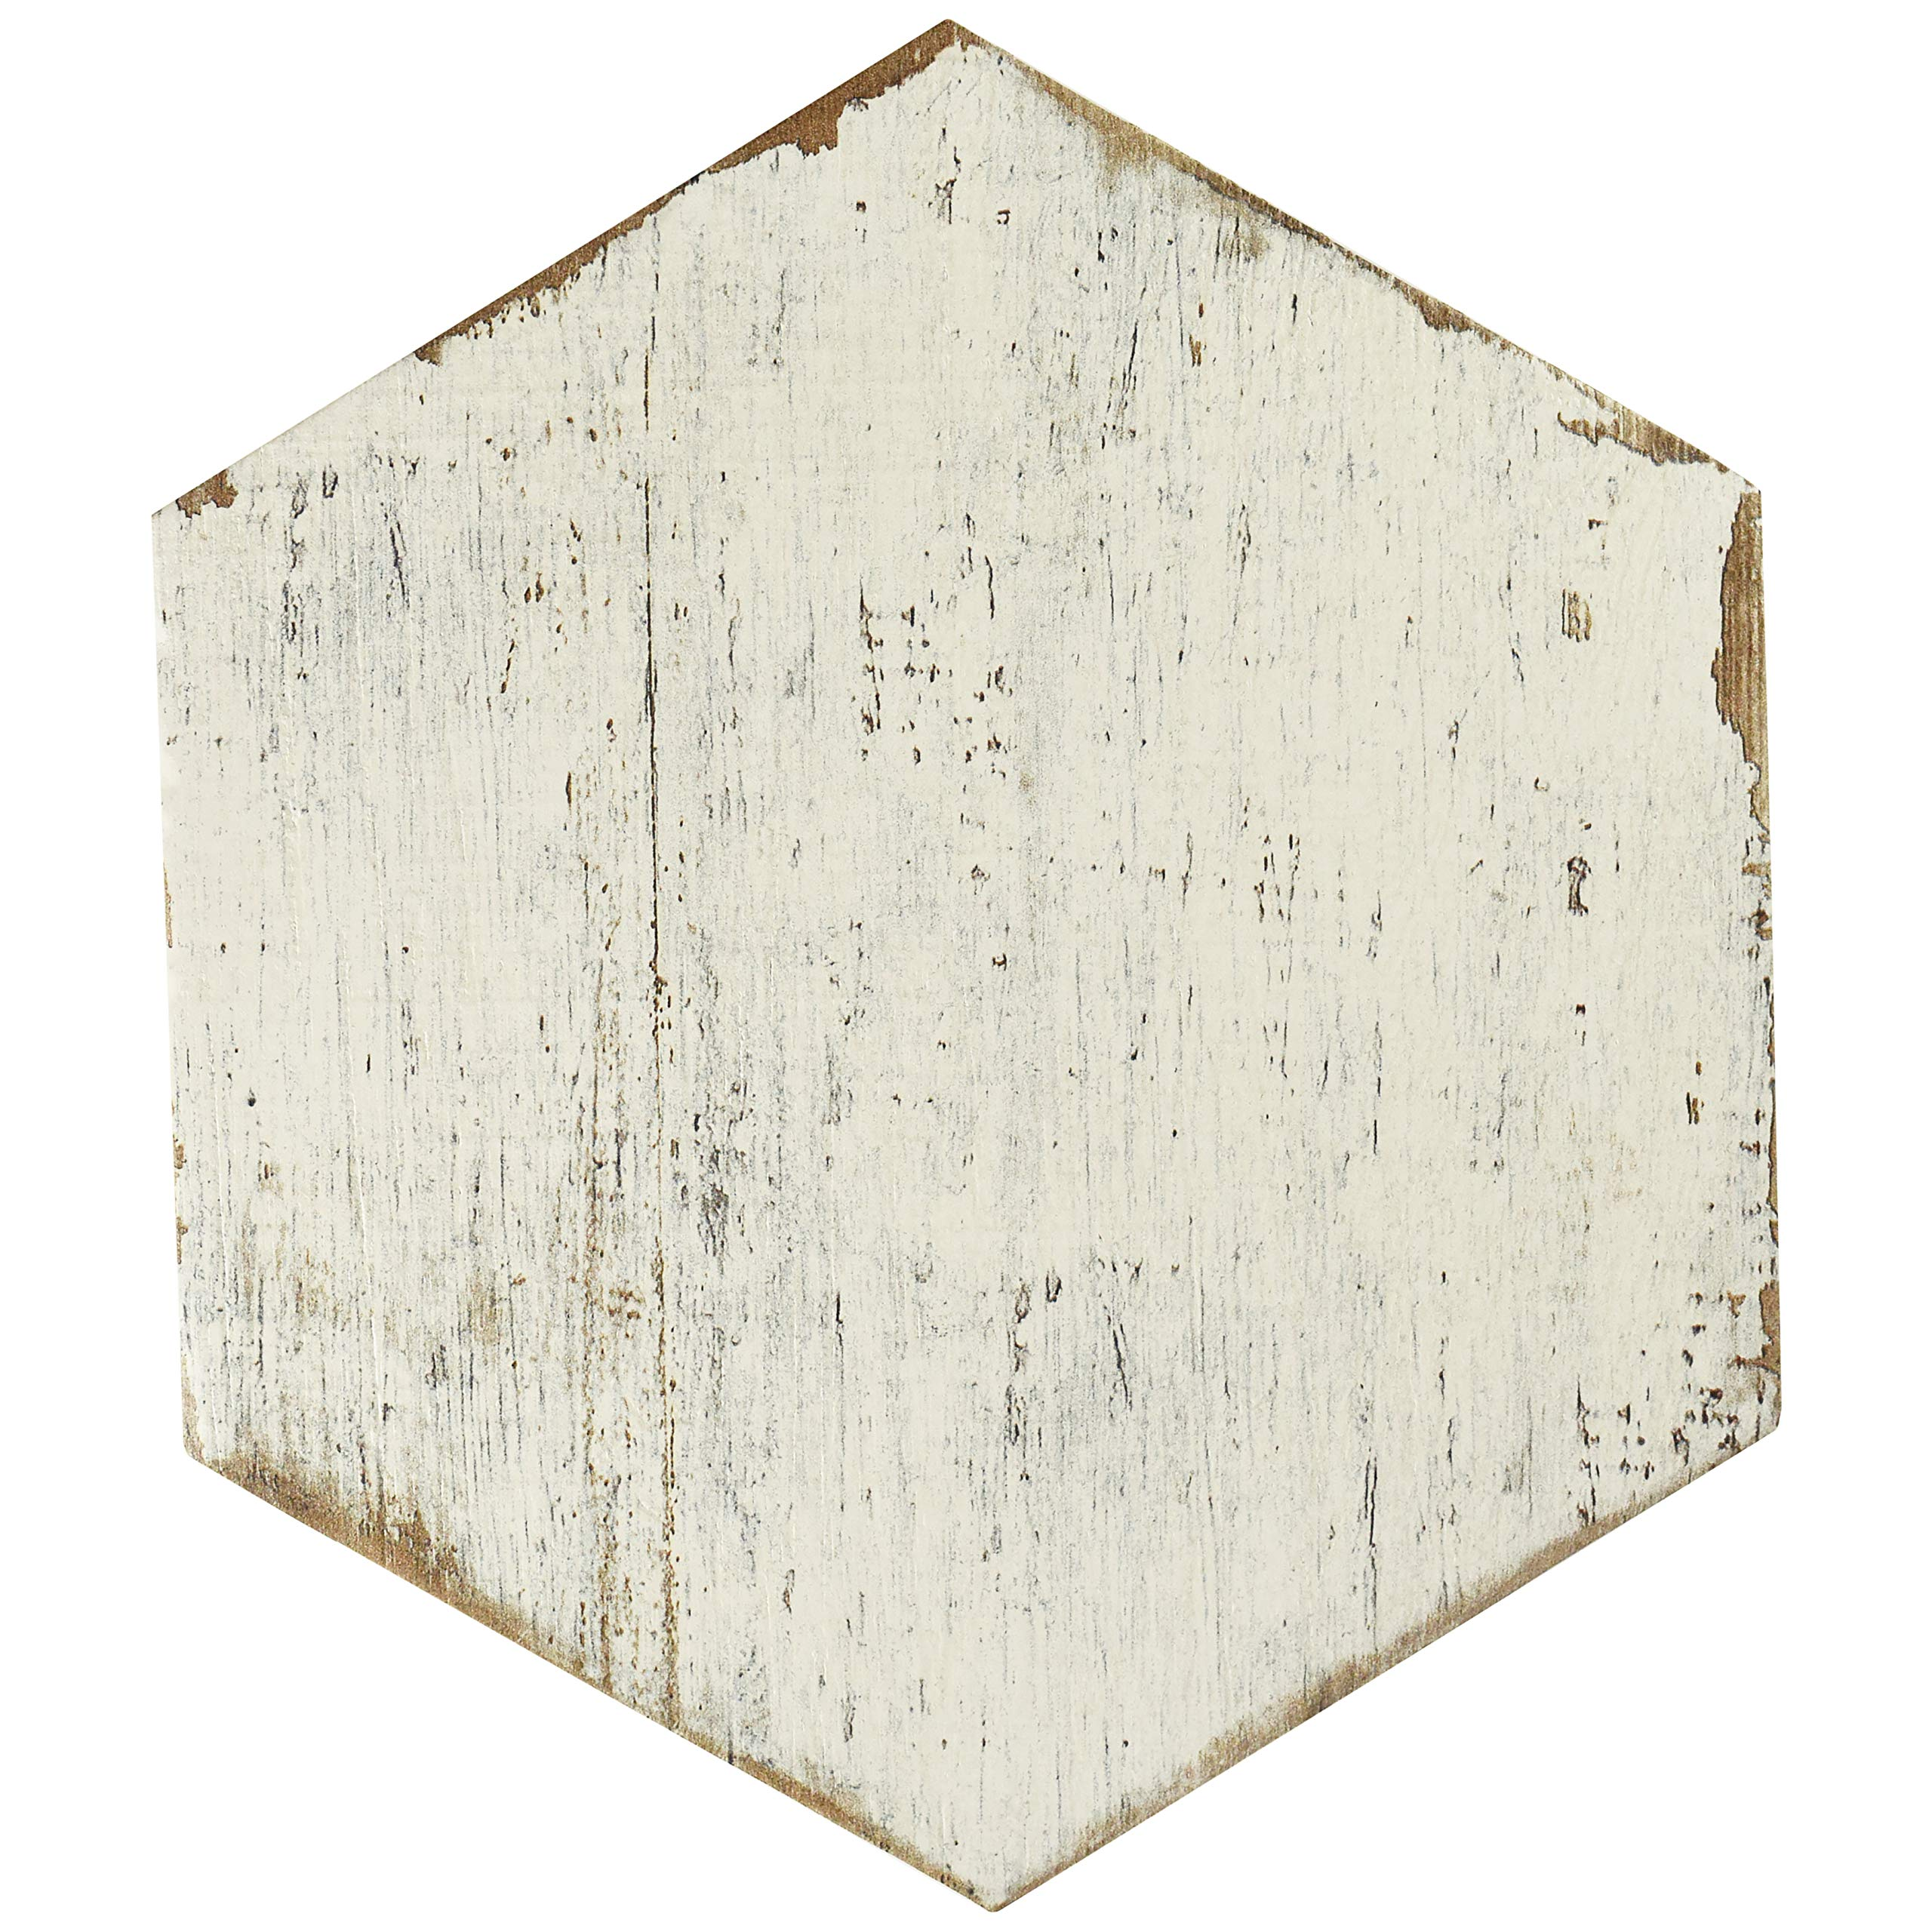 SomerTile FNURTXBL Vintage Hex Porcelain Floor and Wall Tile, 14.125'' x 16.25'', White/Brown